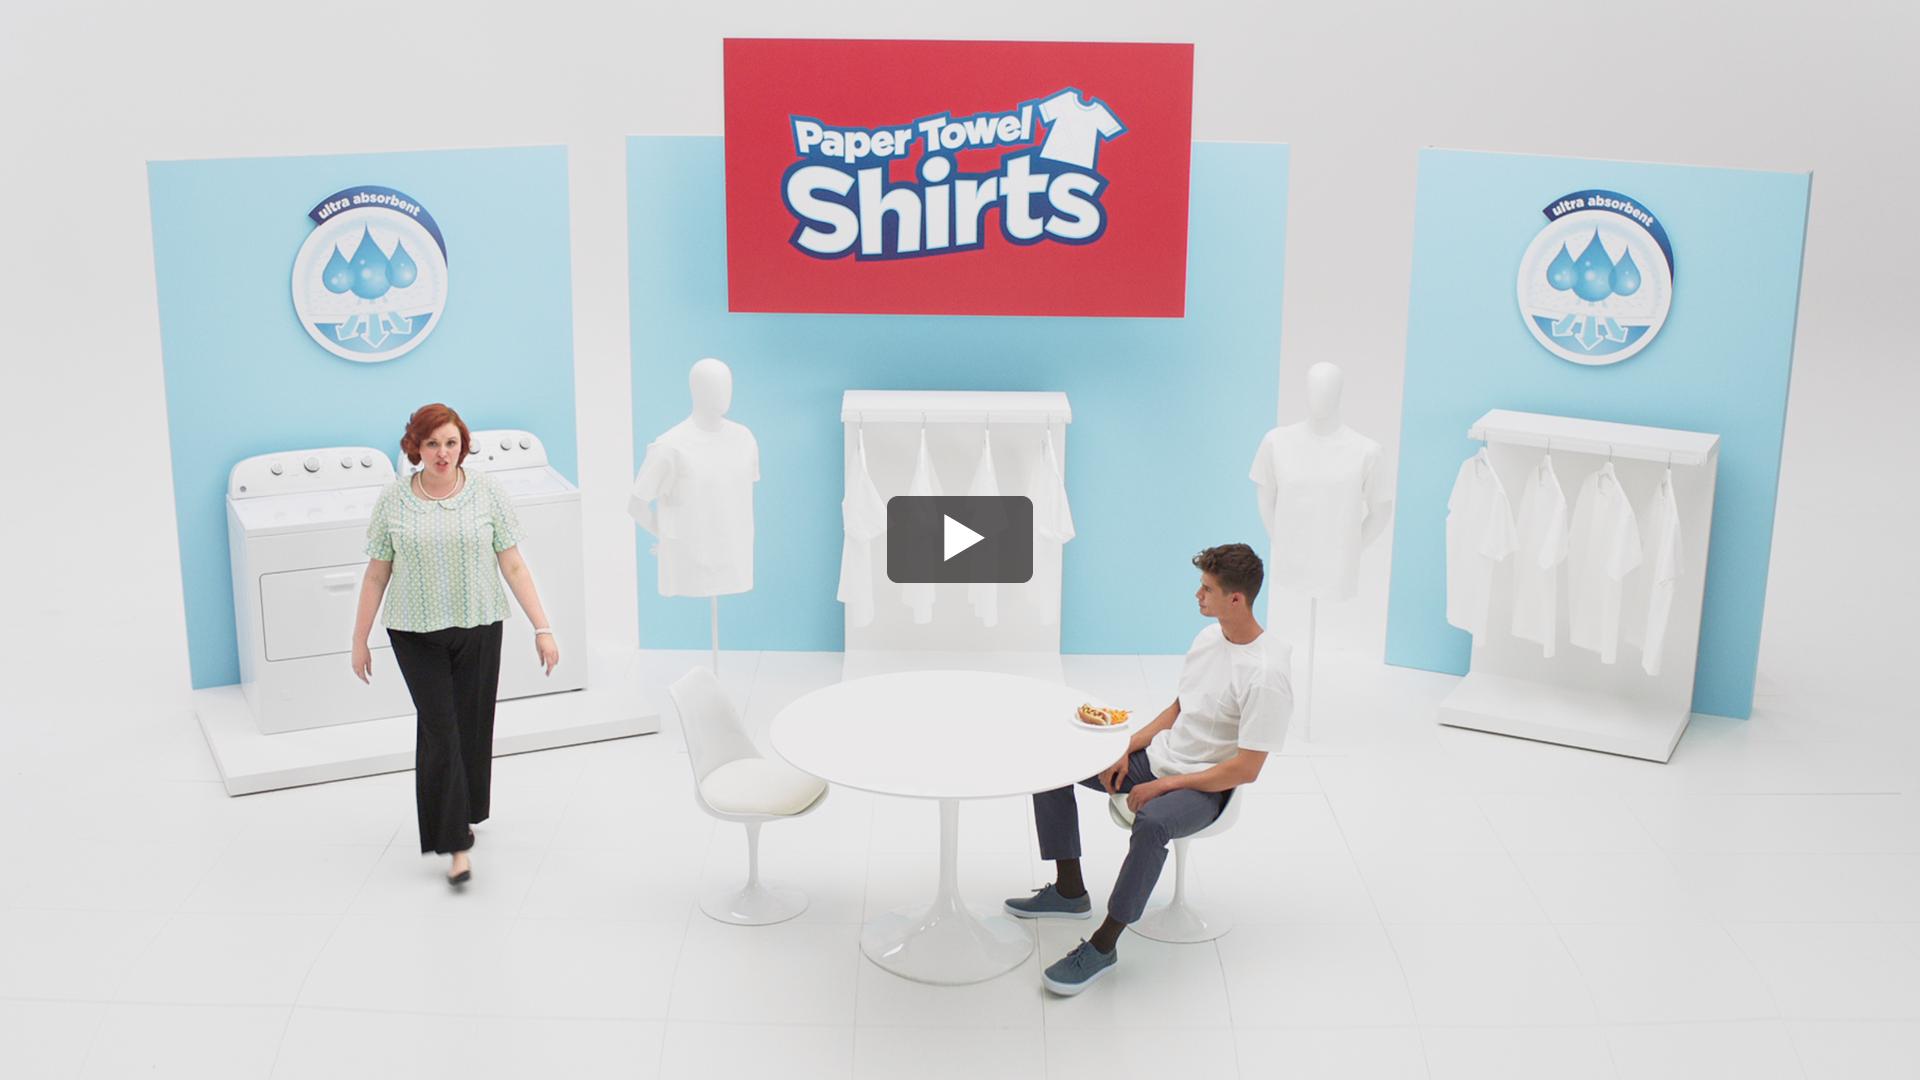 Paper Towel Shirts®